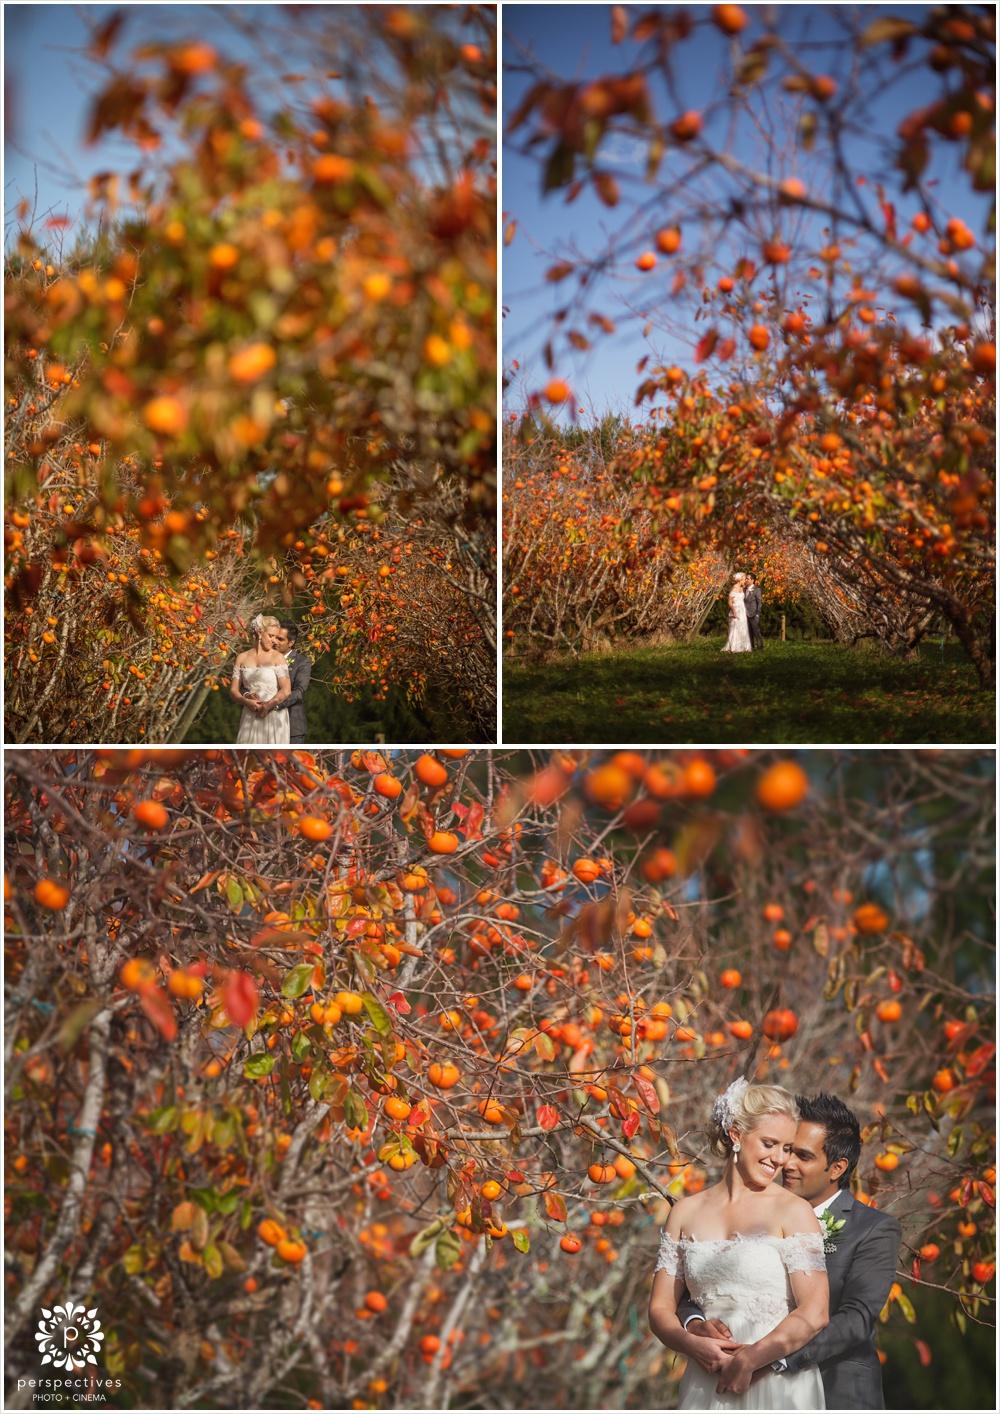 Autumn wedding photo locations Auckland